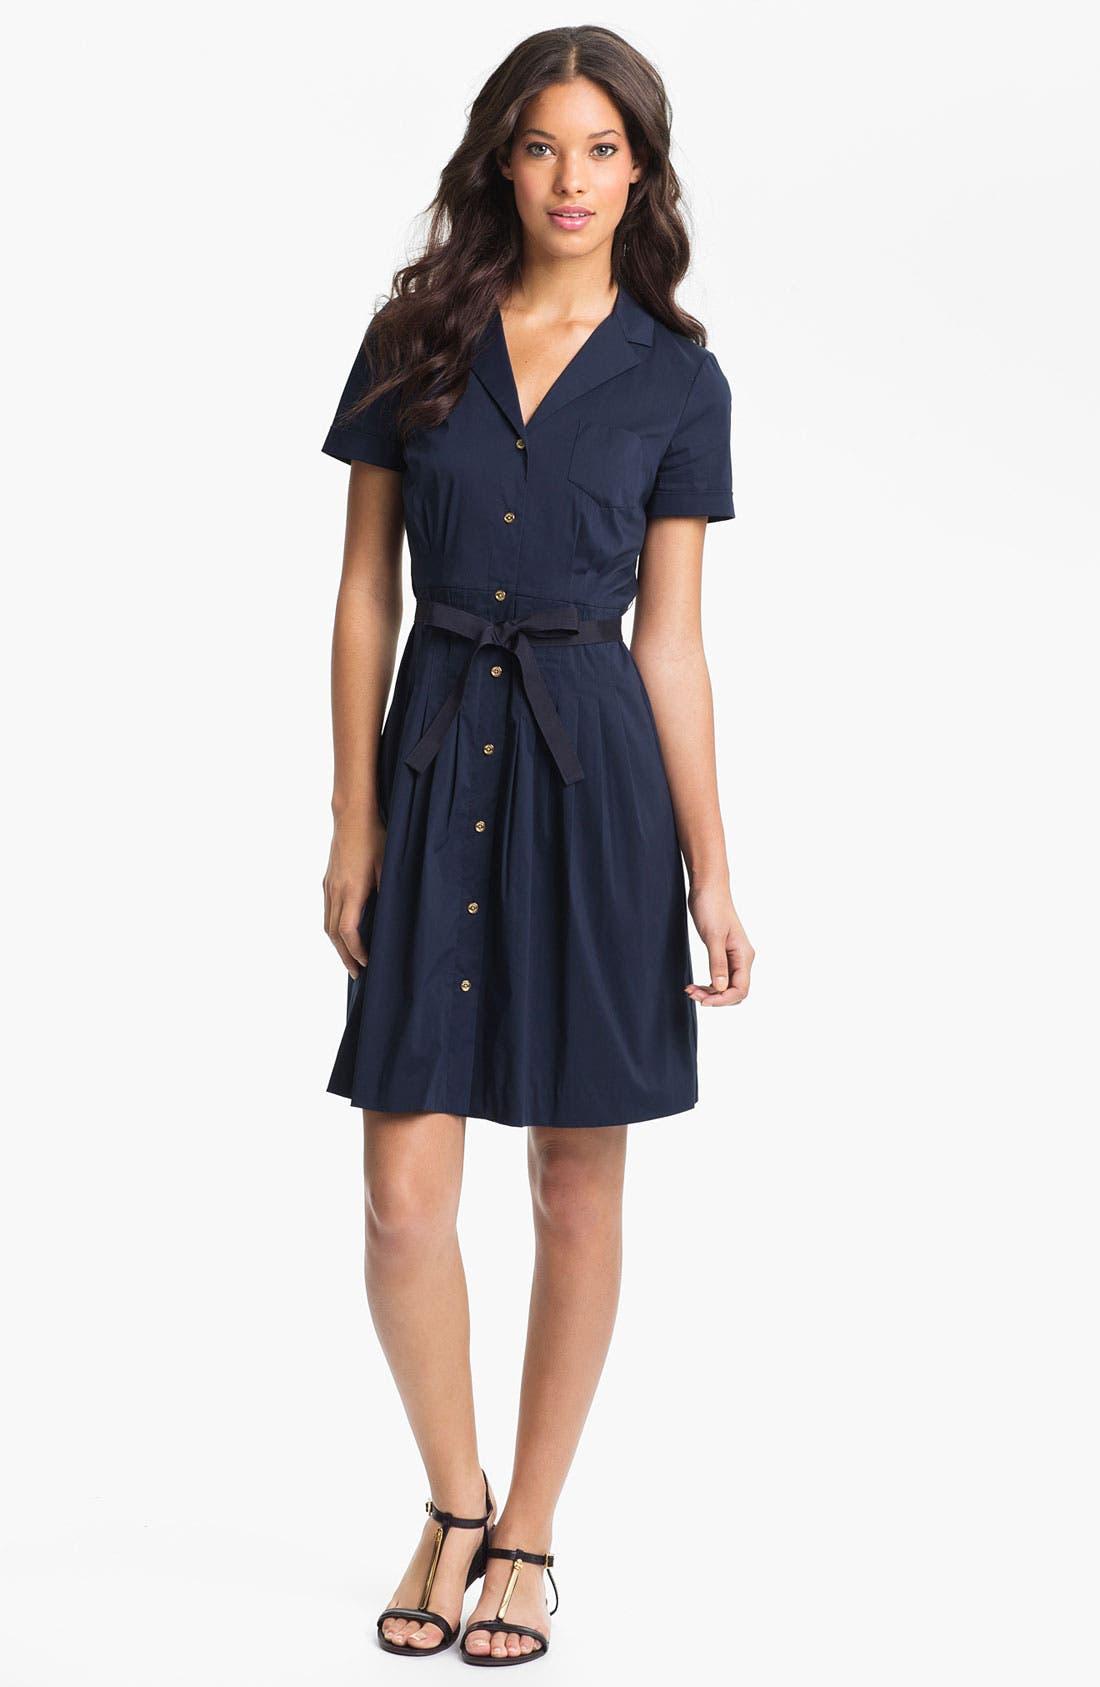 Main Image - Tory Burch 'Janet' Cotton Blend Shirtdress